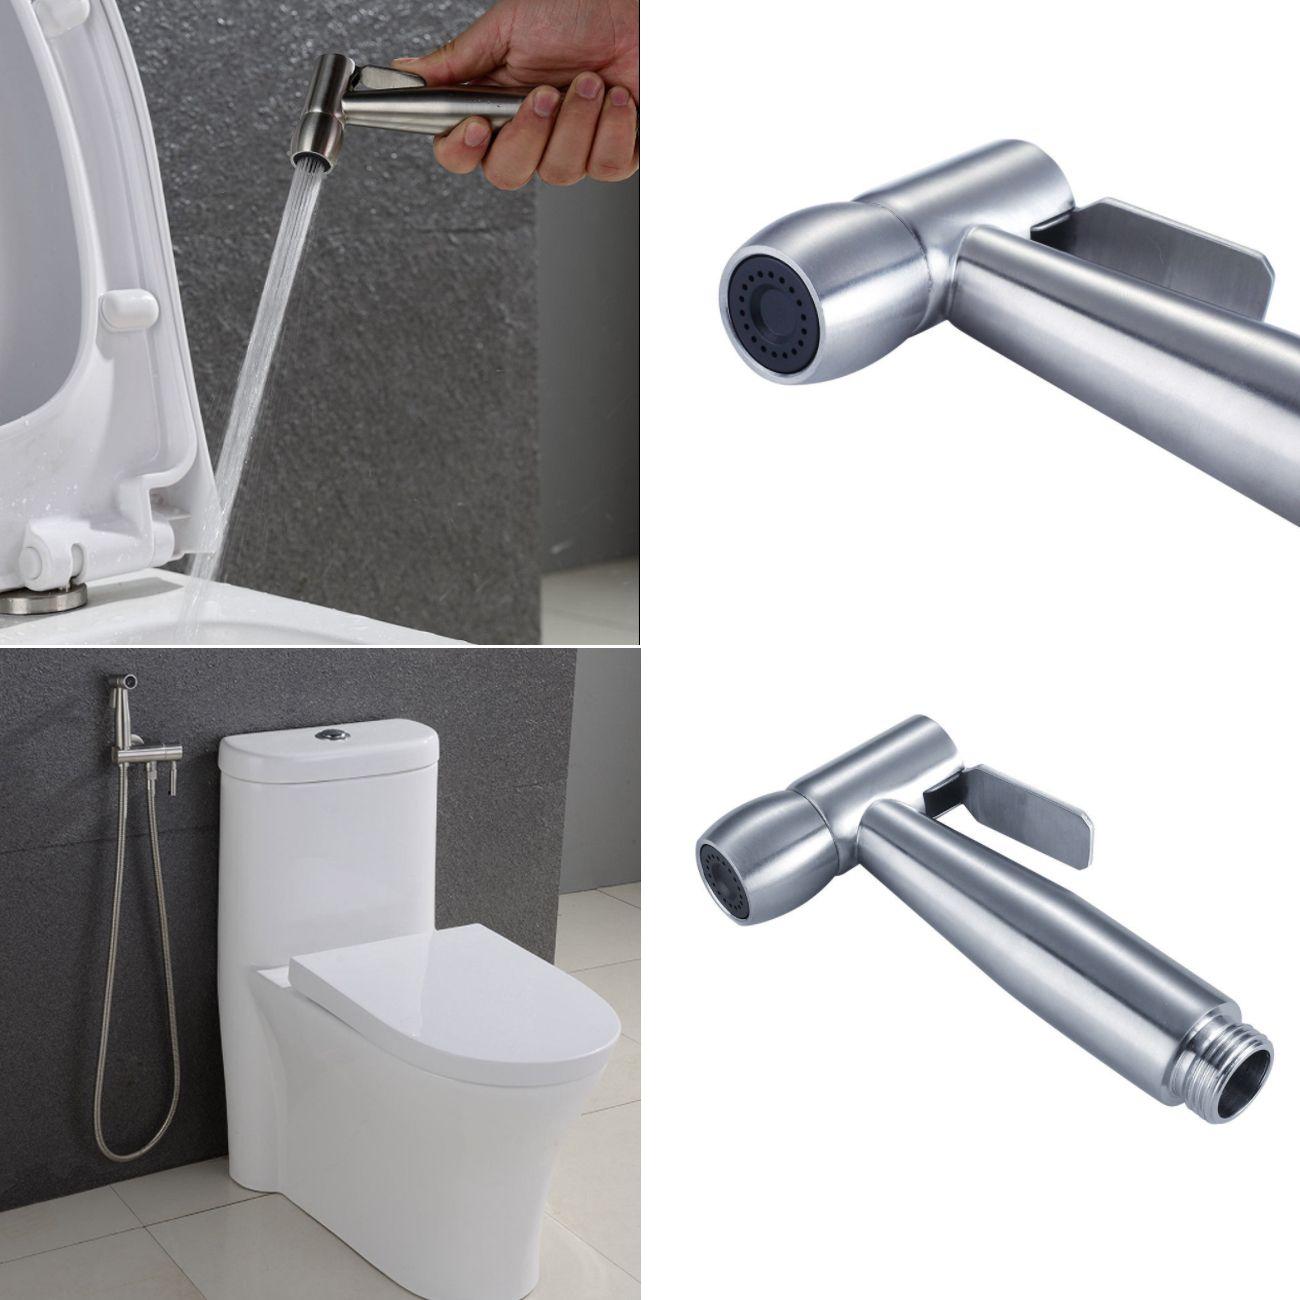 2018 Bathroom Toilet Bidet Spray Handheld Shower Head With Wall ...